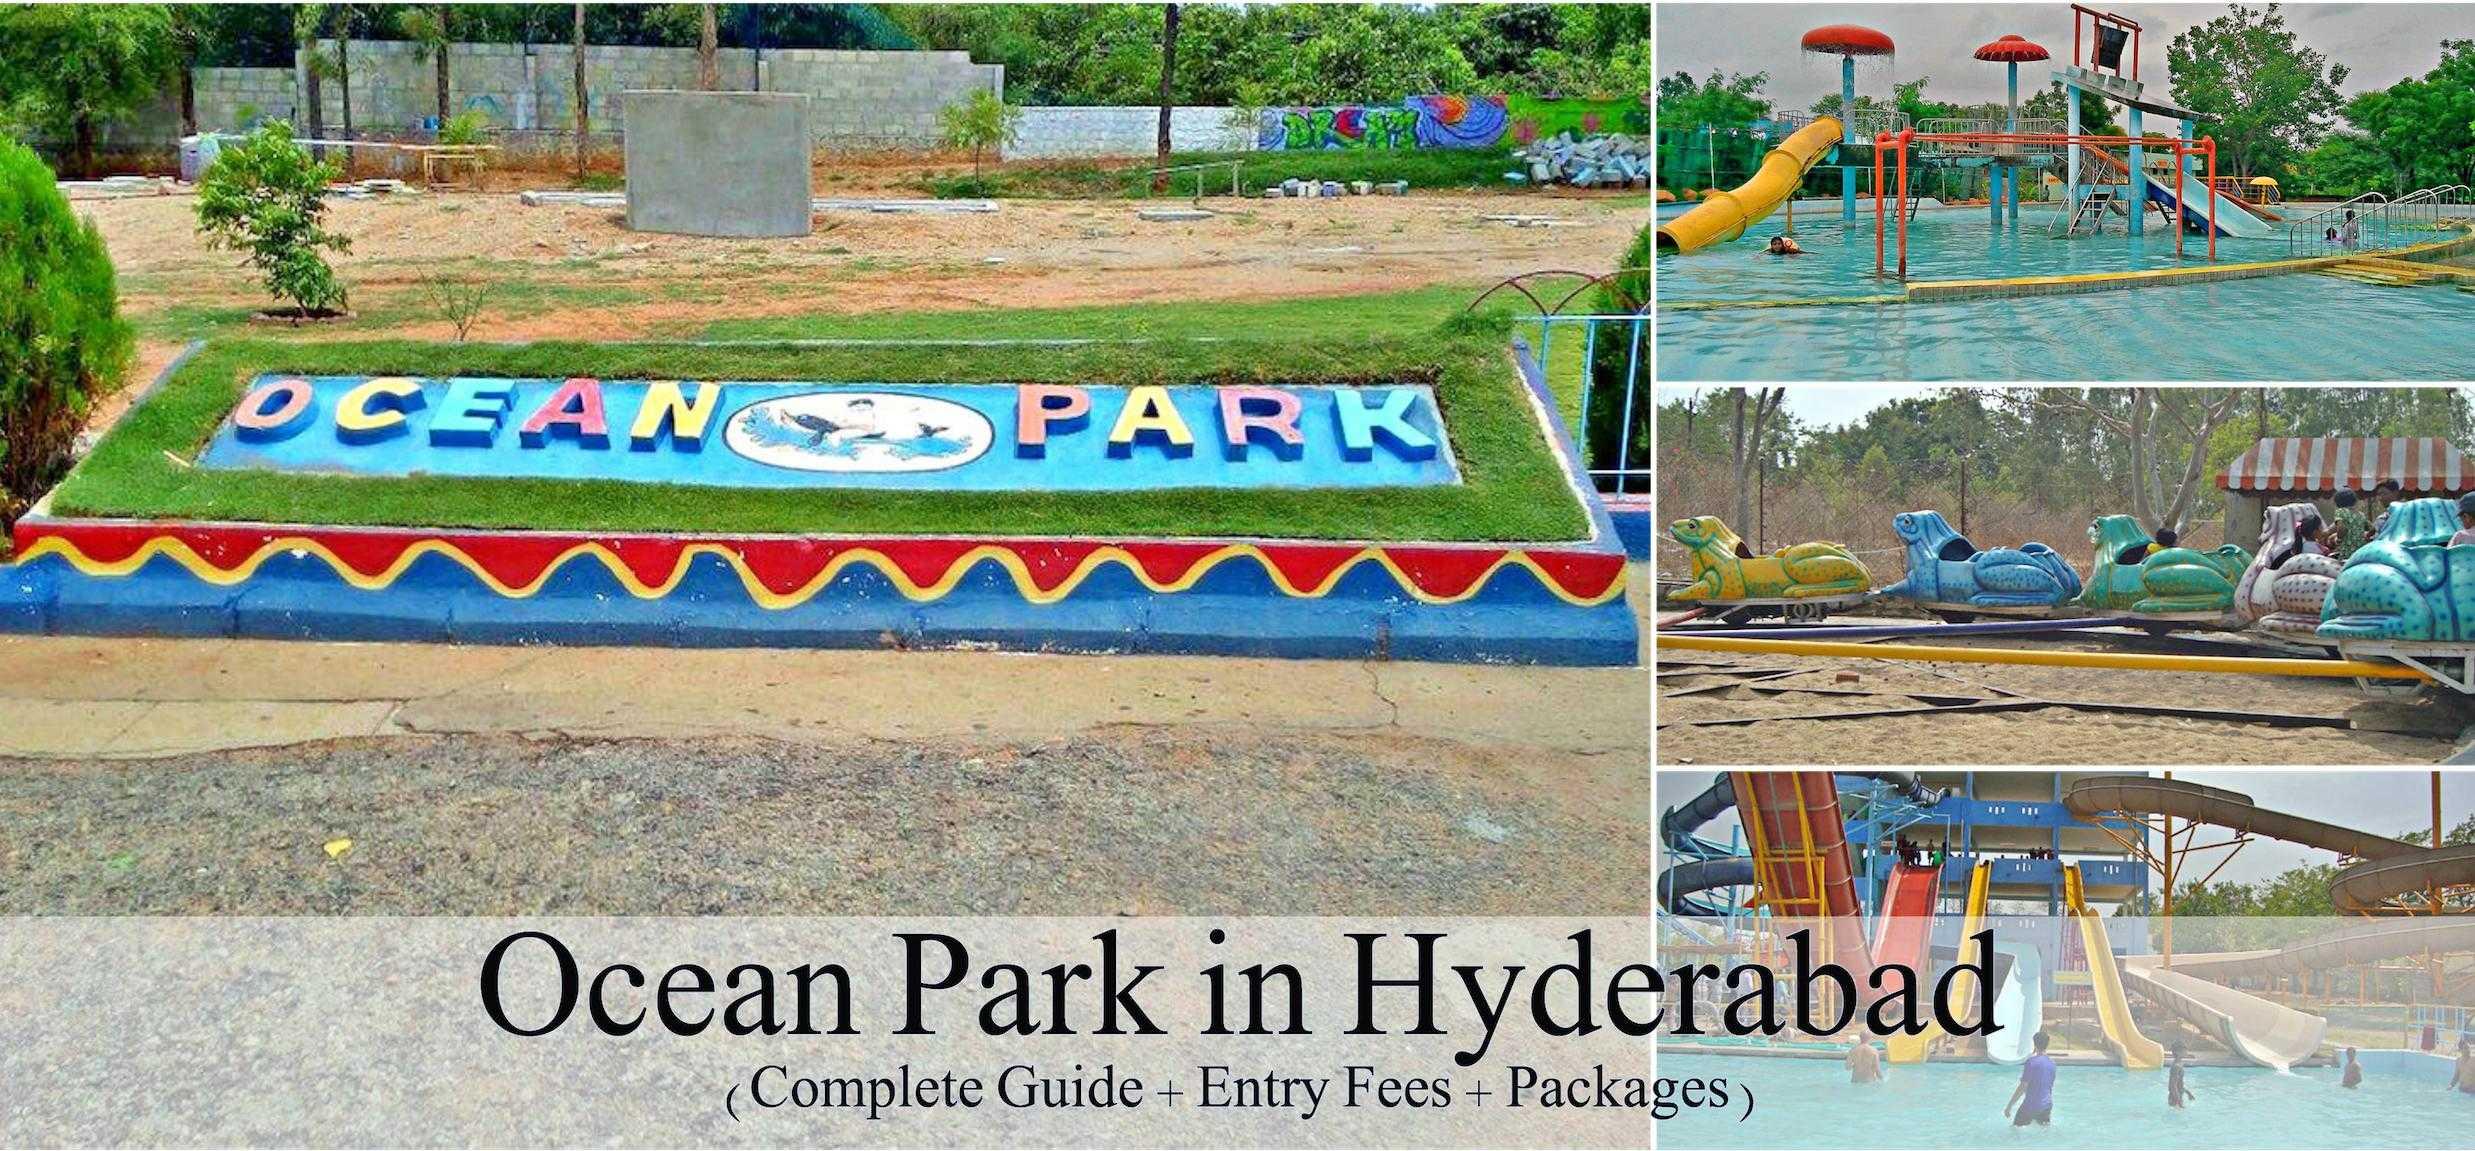 Ocean-park-in-Hyderabad.jpg